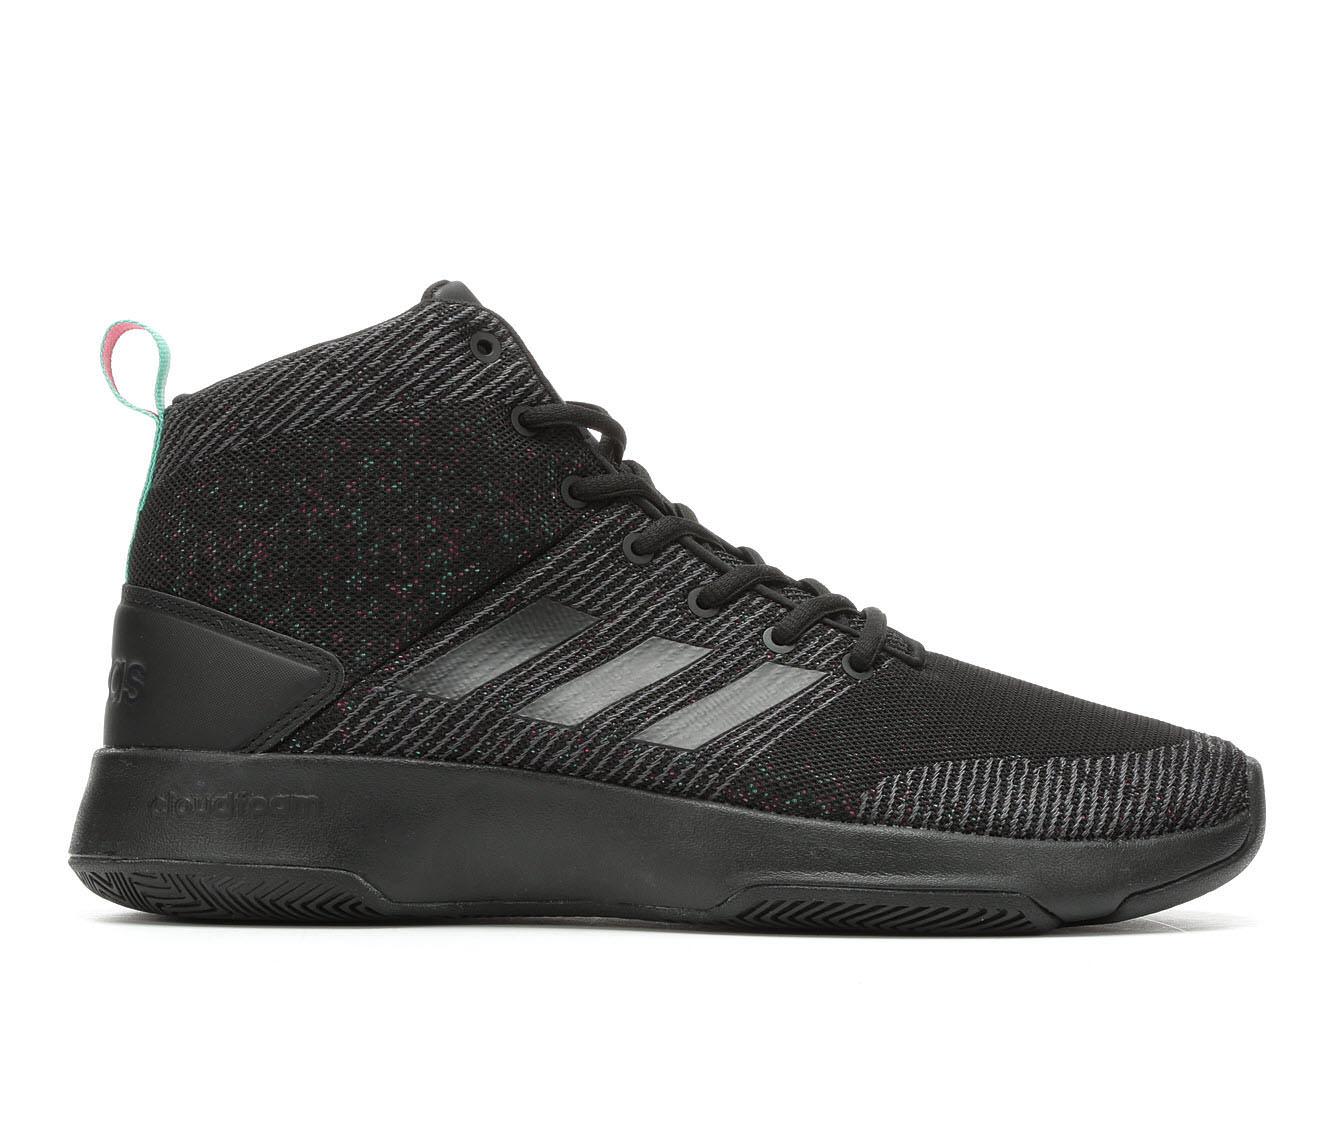 Men's Adidas Cloudfoam Executor Mid Basketball Shoes (Black - Size 11.5) 1698669